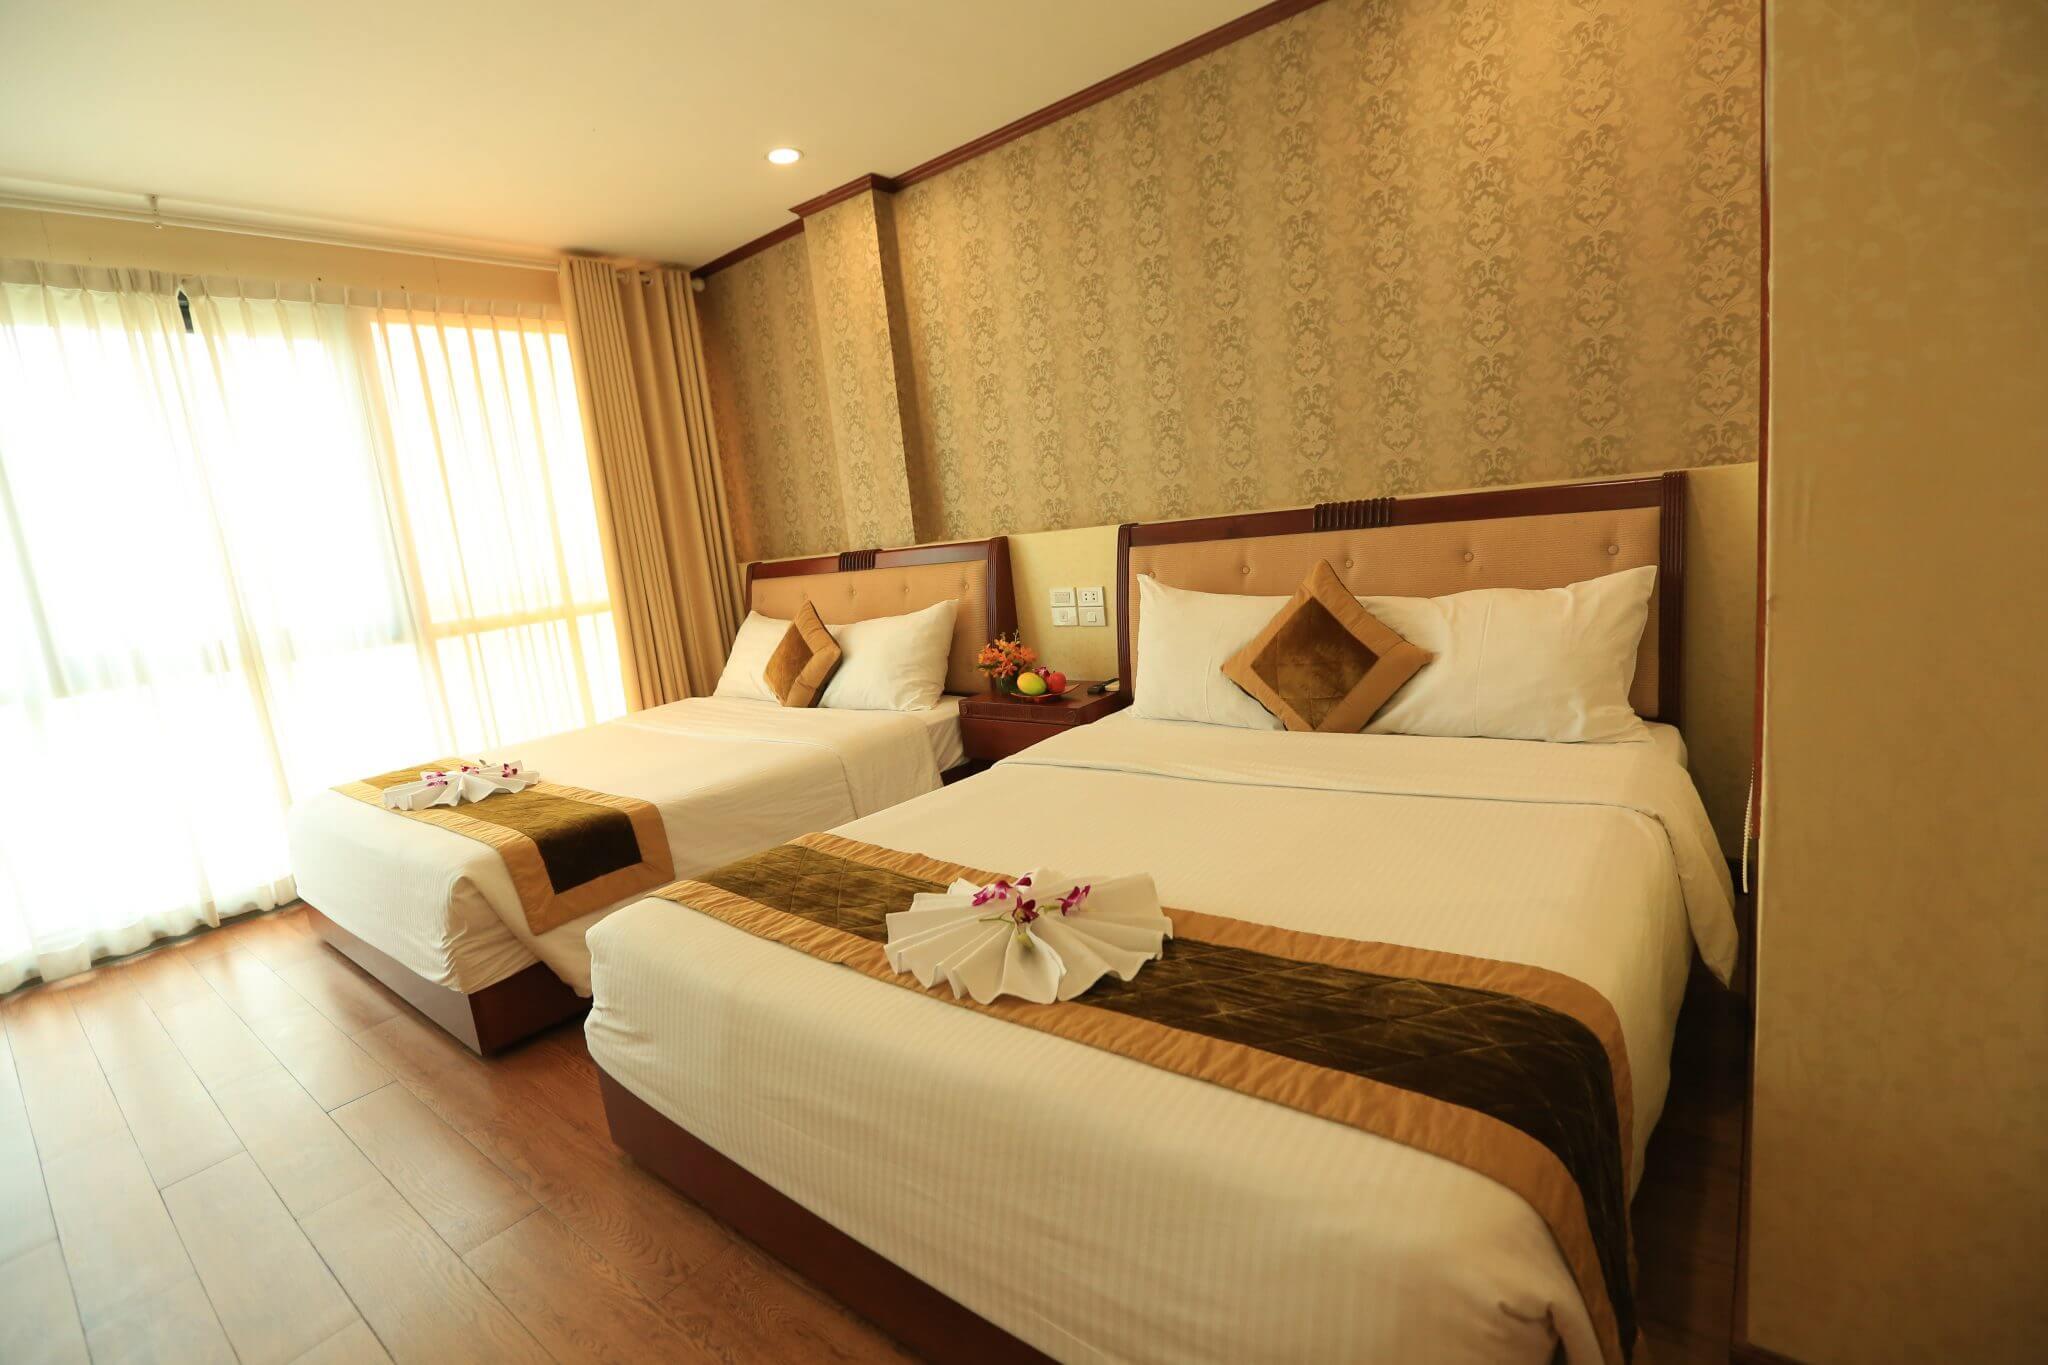 sunset-westlake-hanoi-hotel-room-17